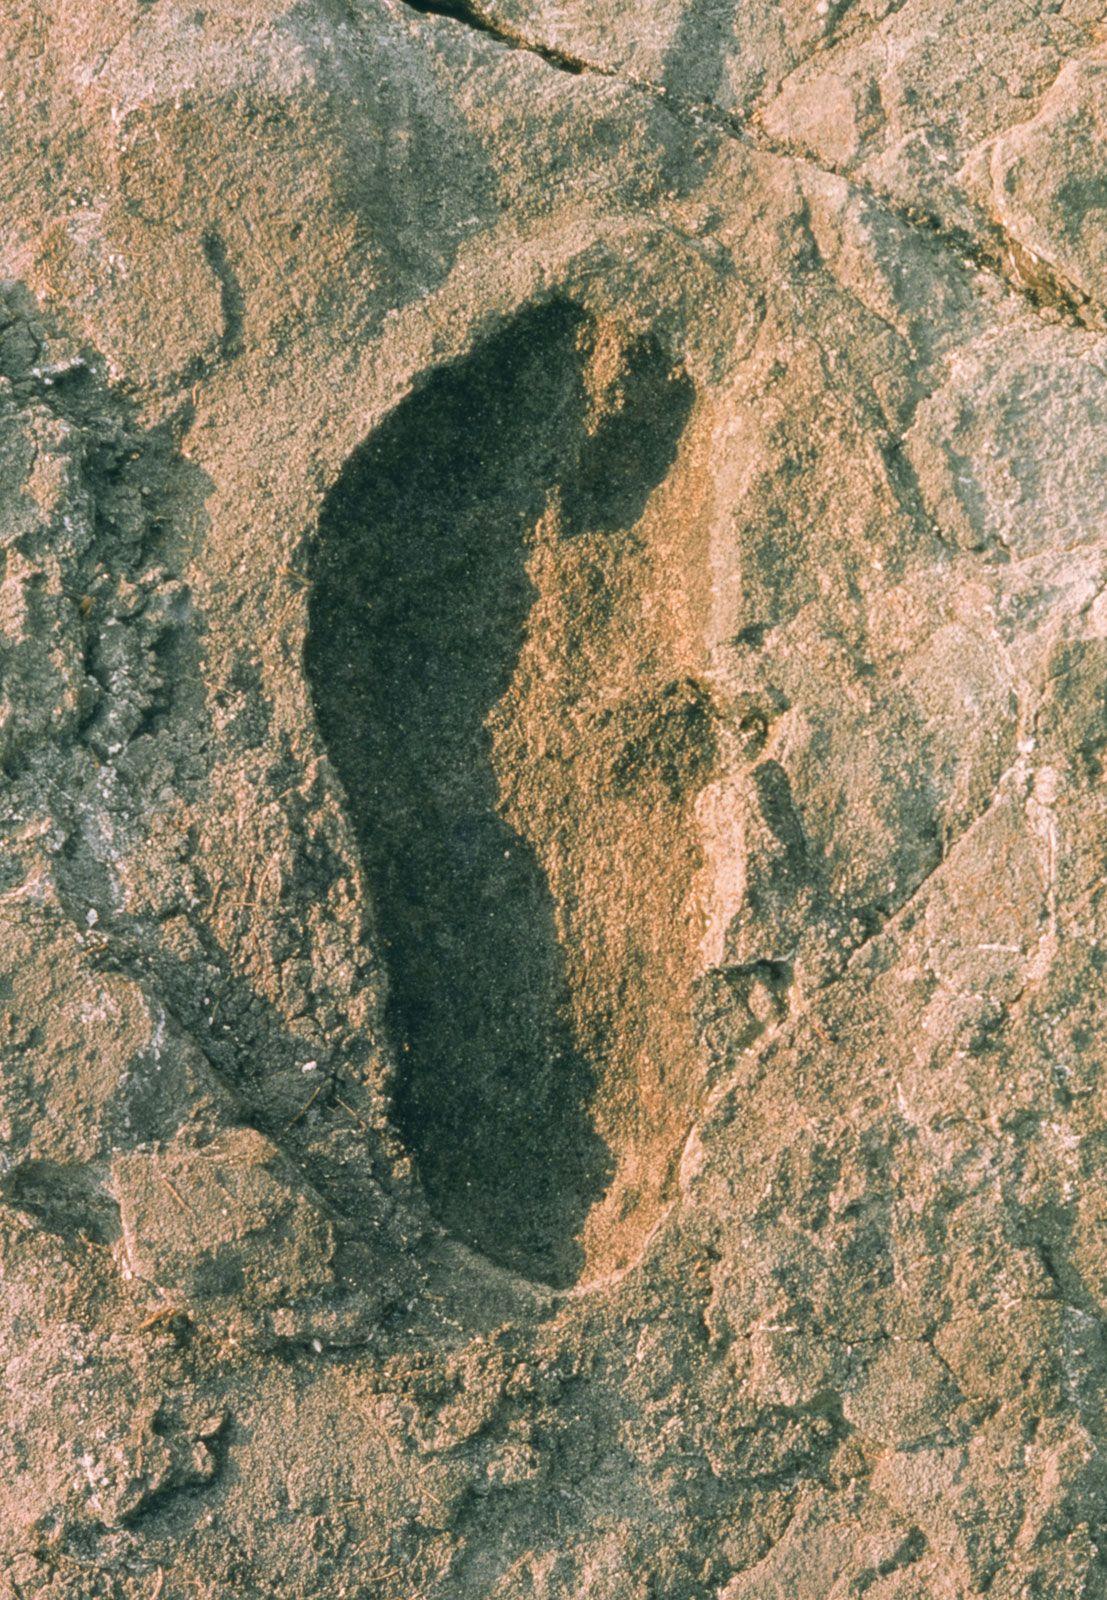 Laetoli tanzania footprints dating